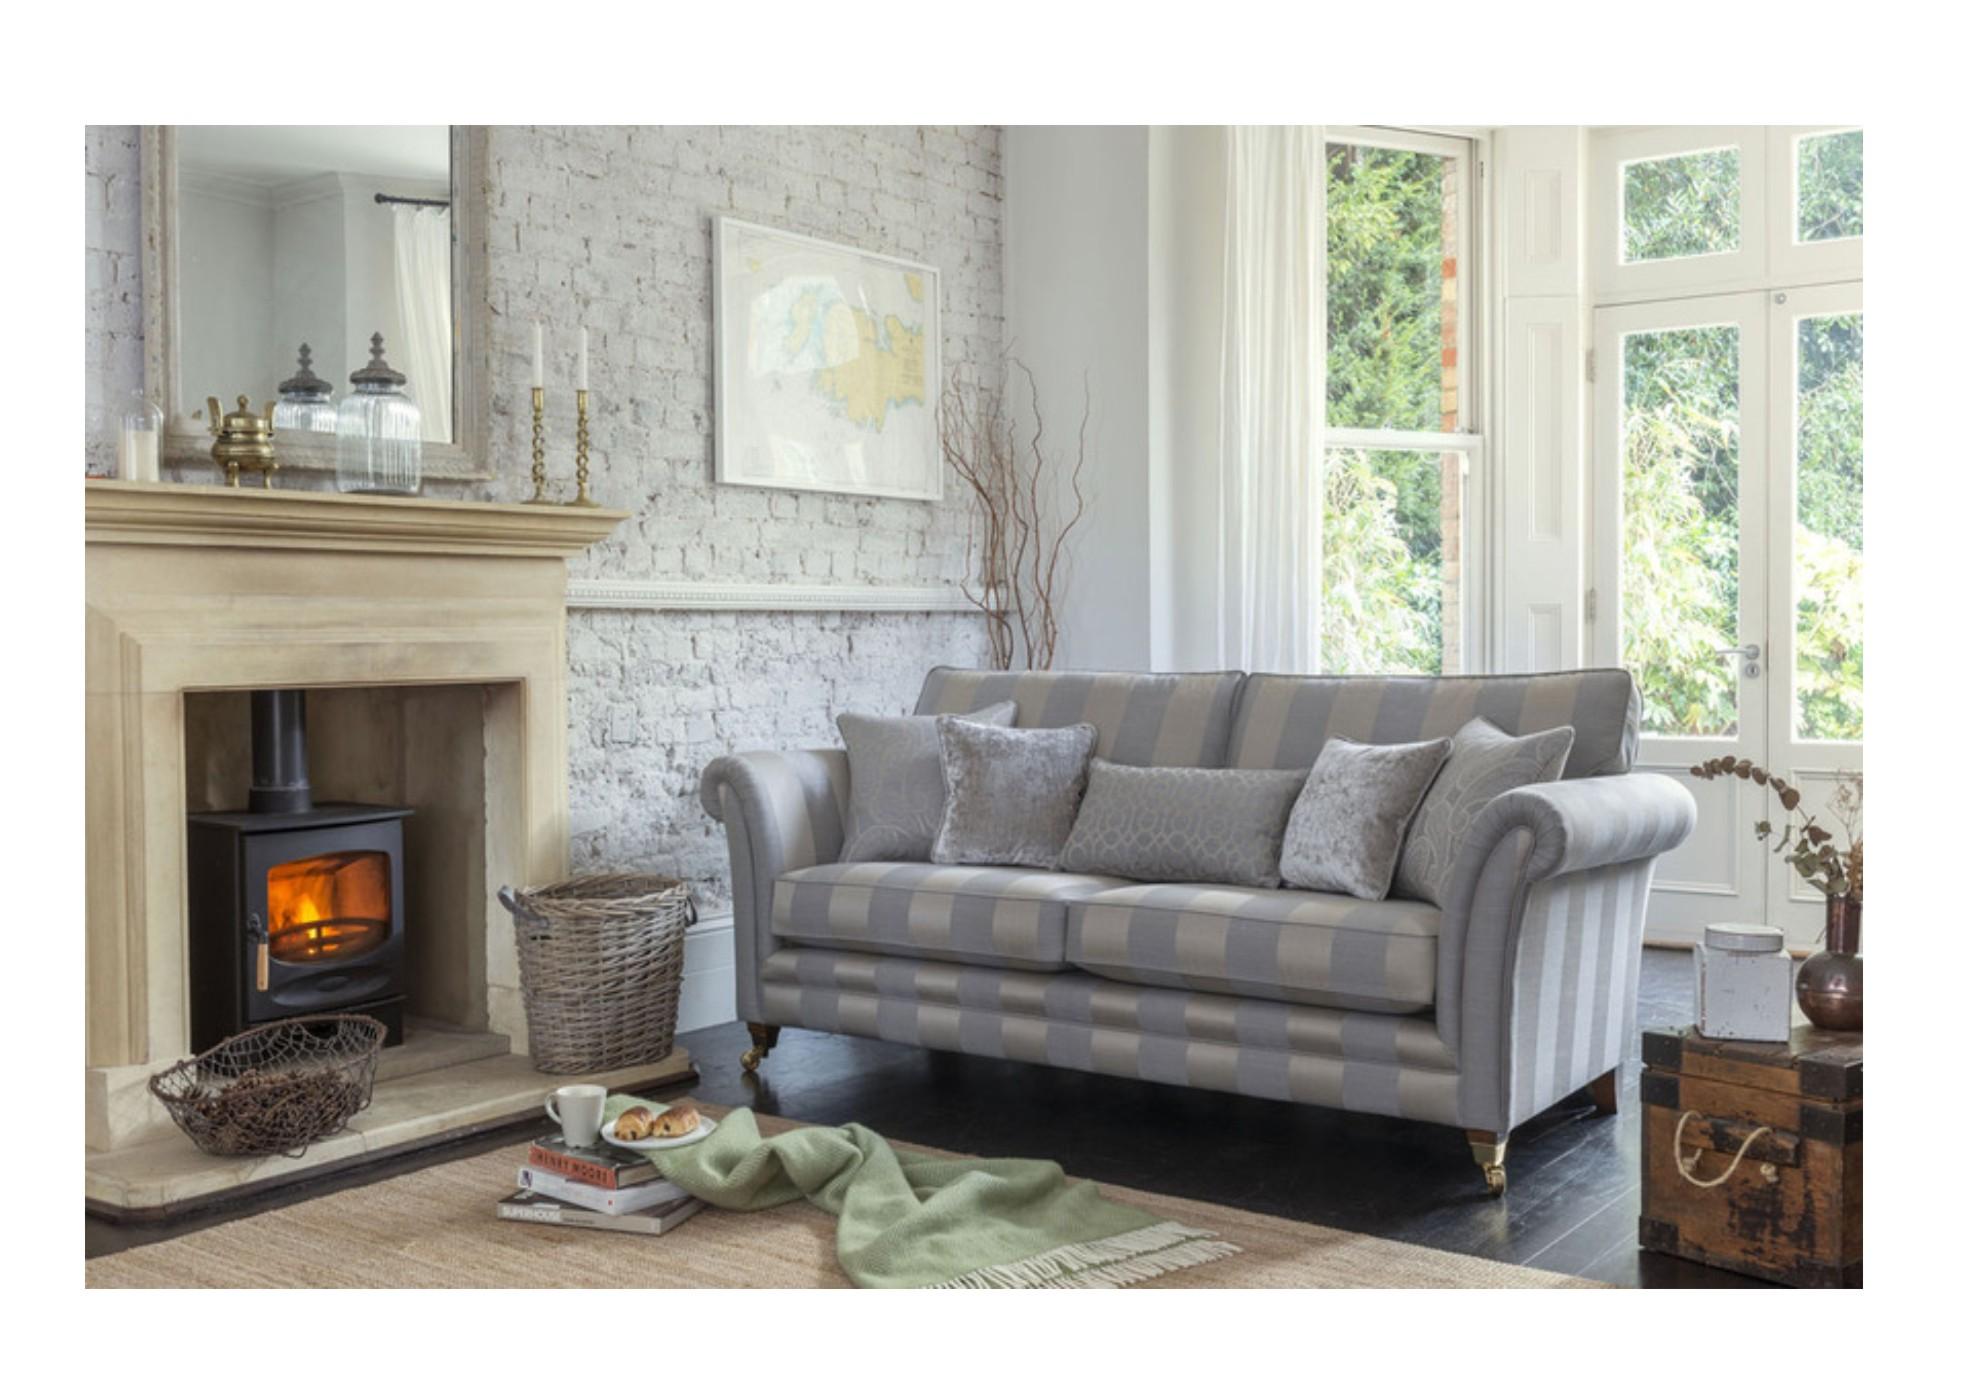 Adelphi Lowry 3 Seater Sofa